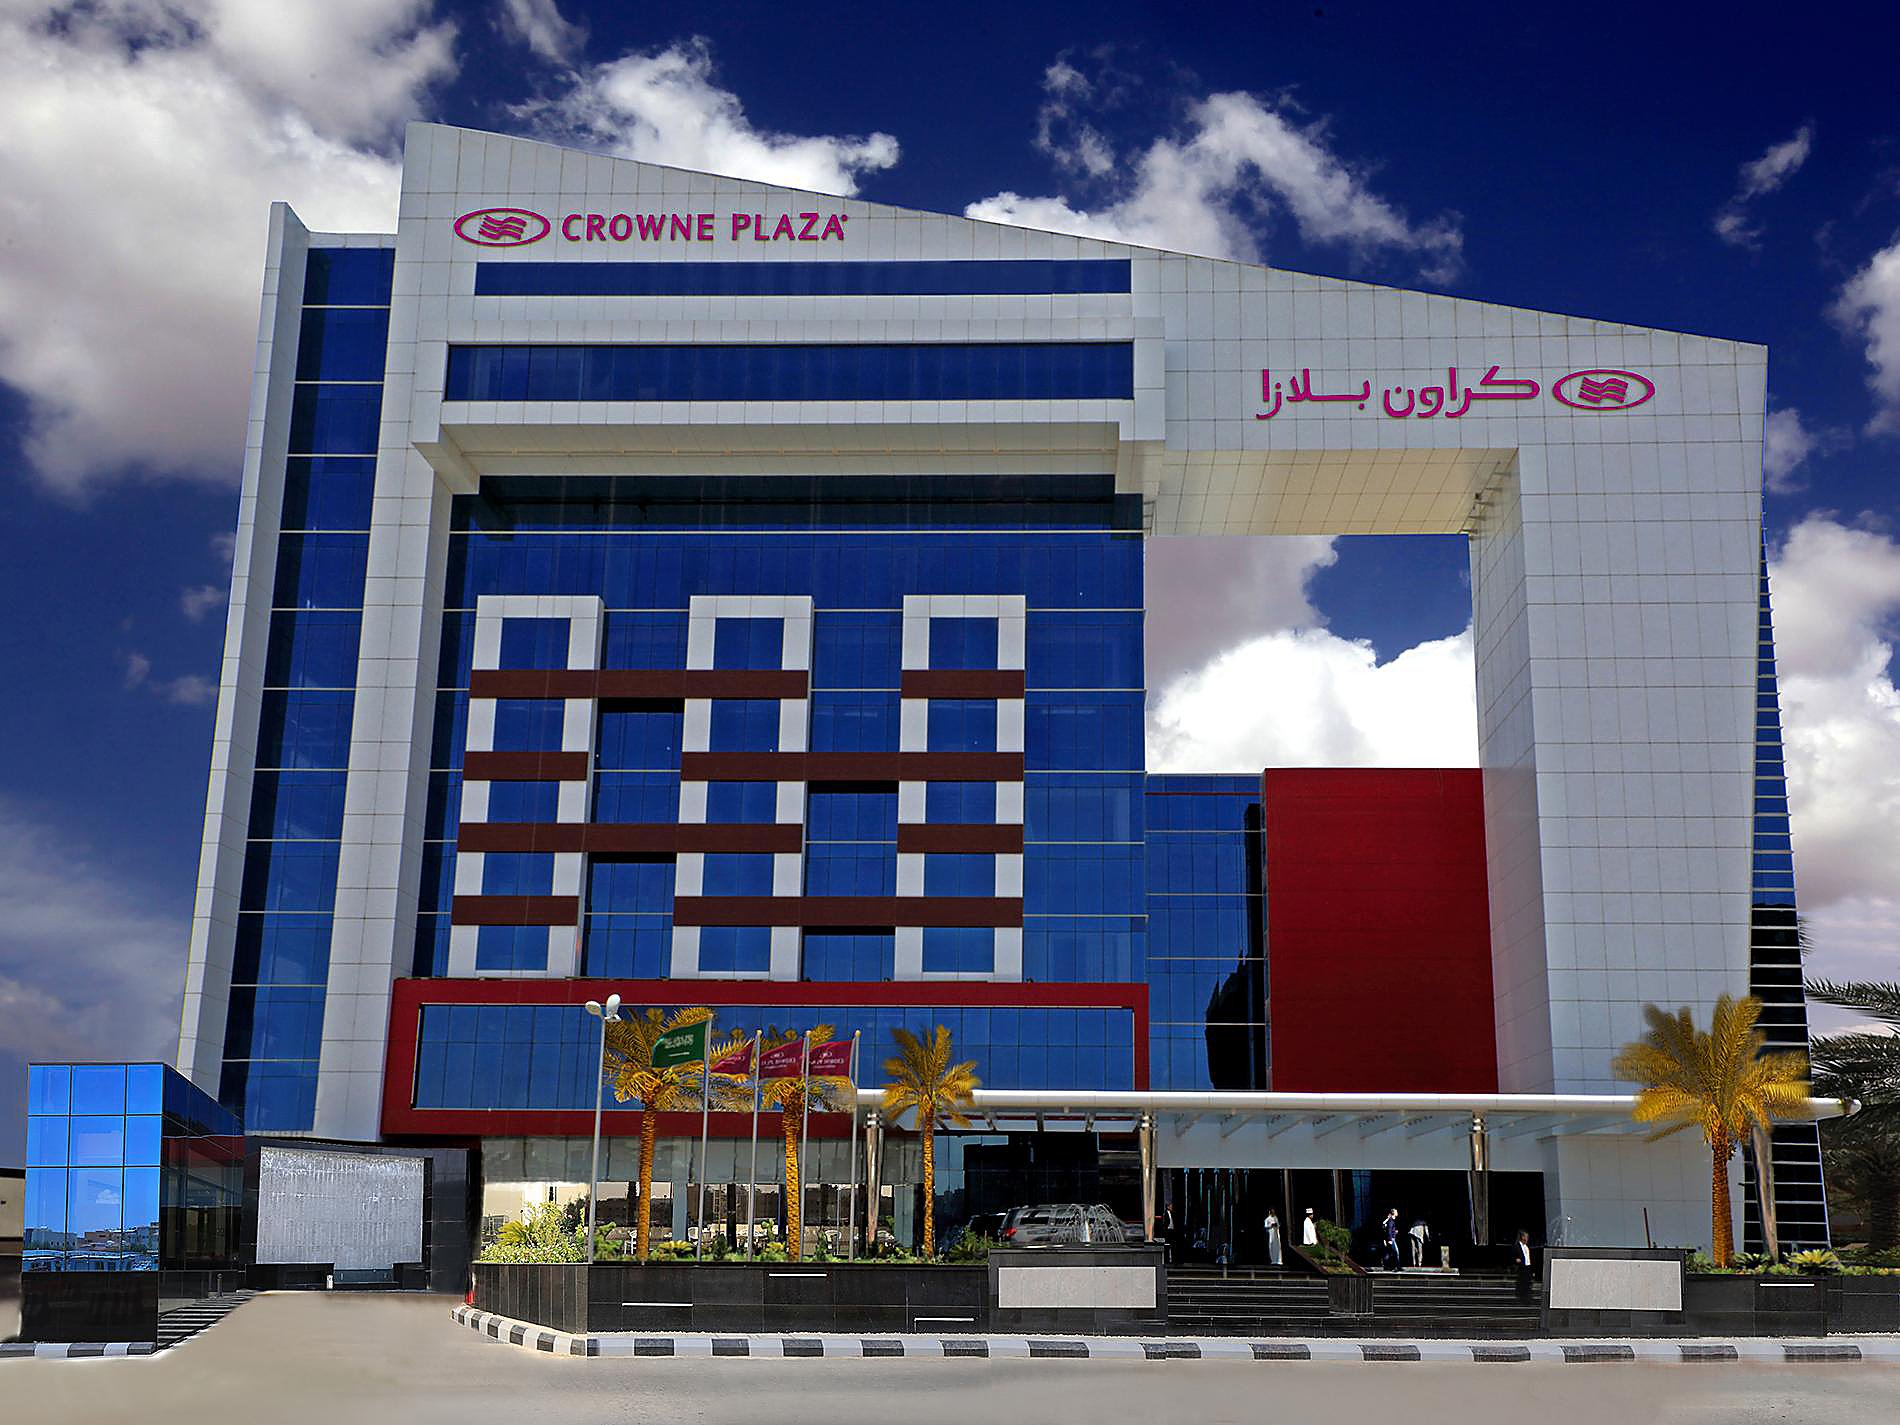 Crowne Plaza Riyadh Minhal - Riyadh, Saudi Arabia